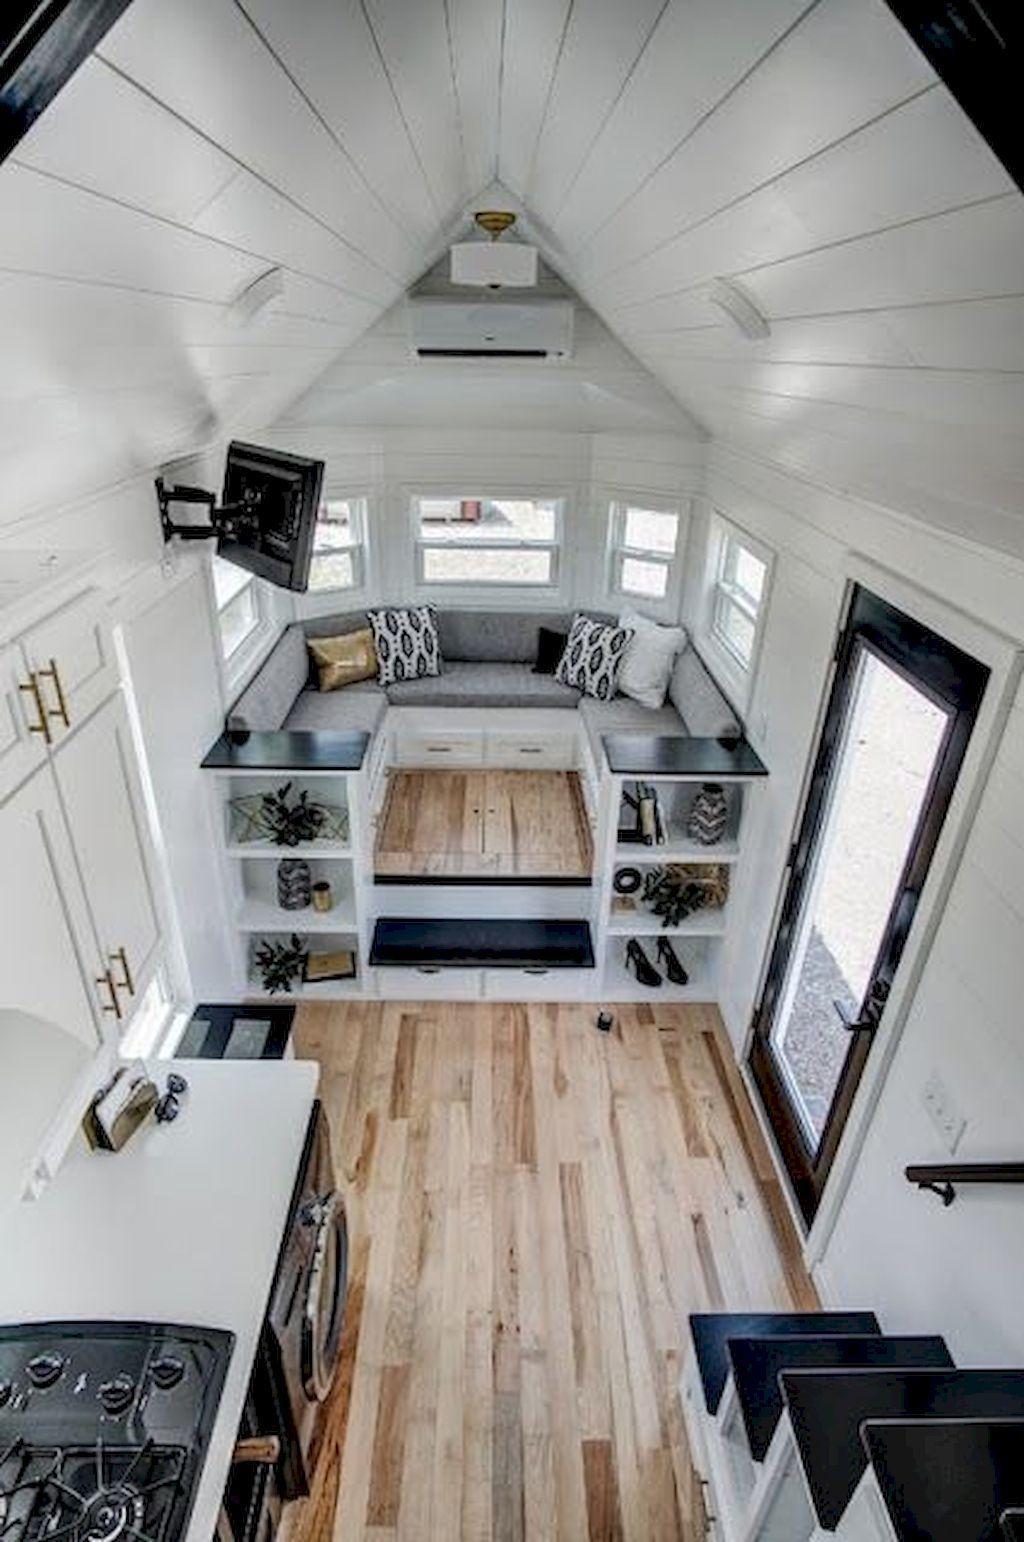 Cool 50 Genius Tiny House Living Room Decor Ideas Https://decoremodel.com